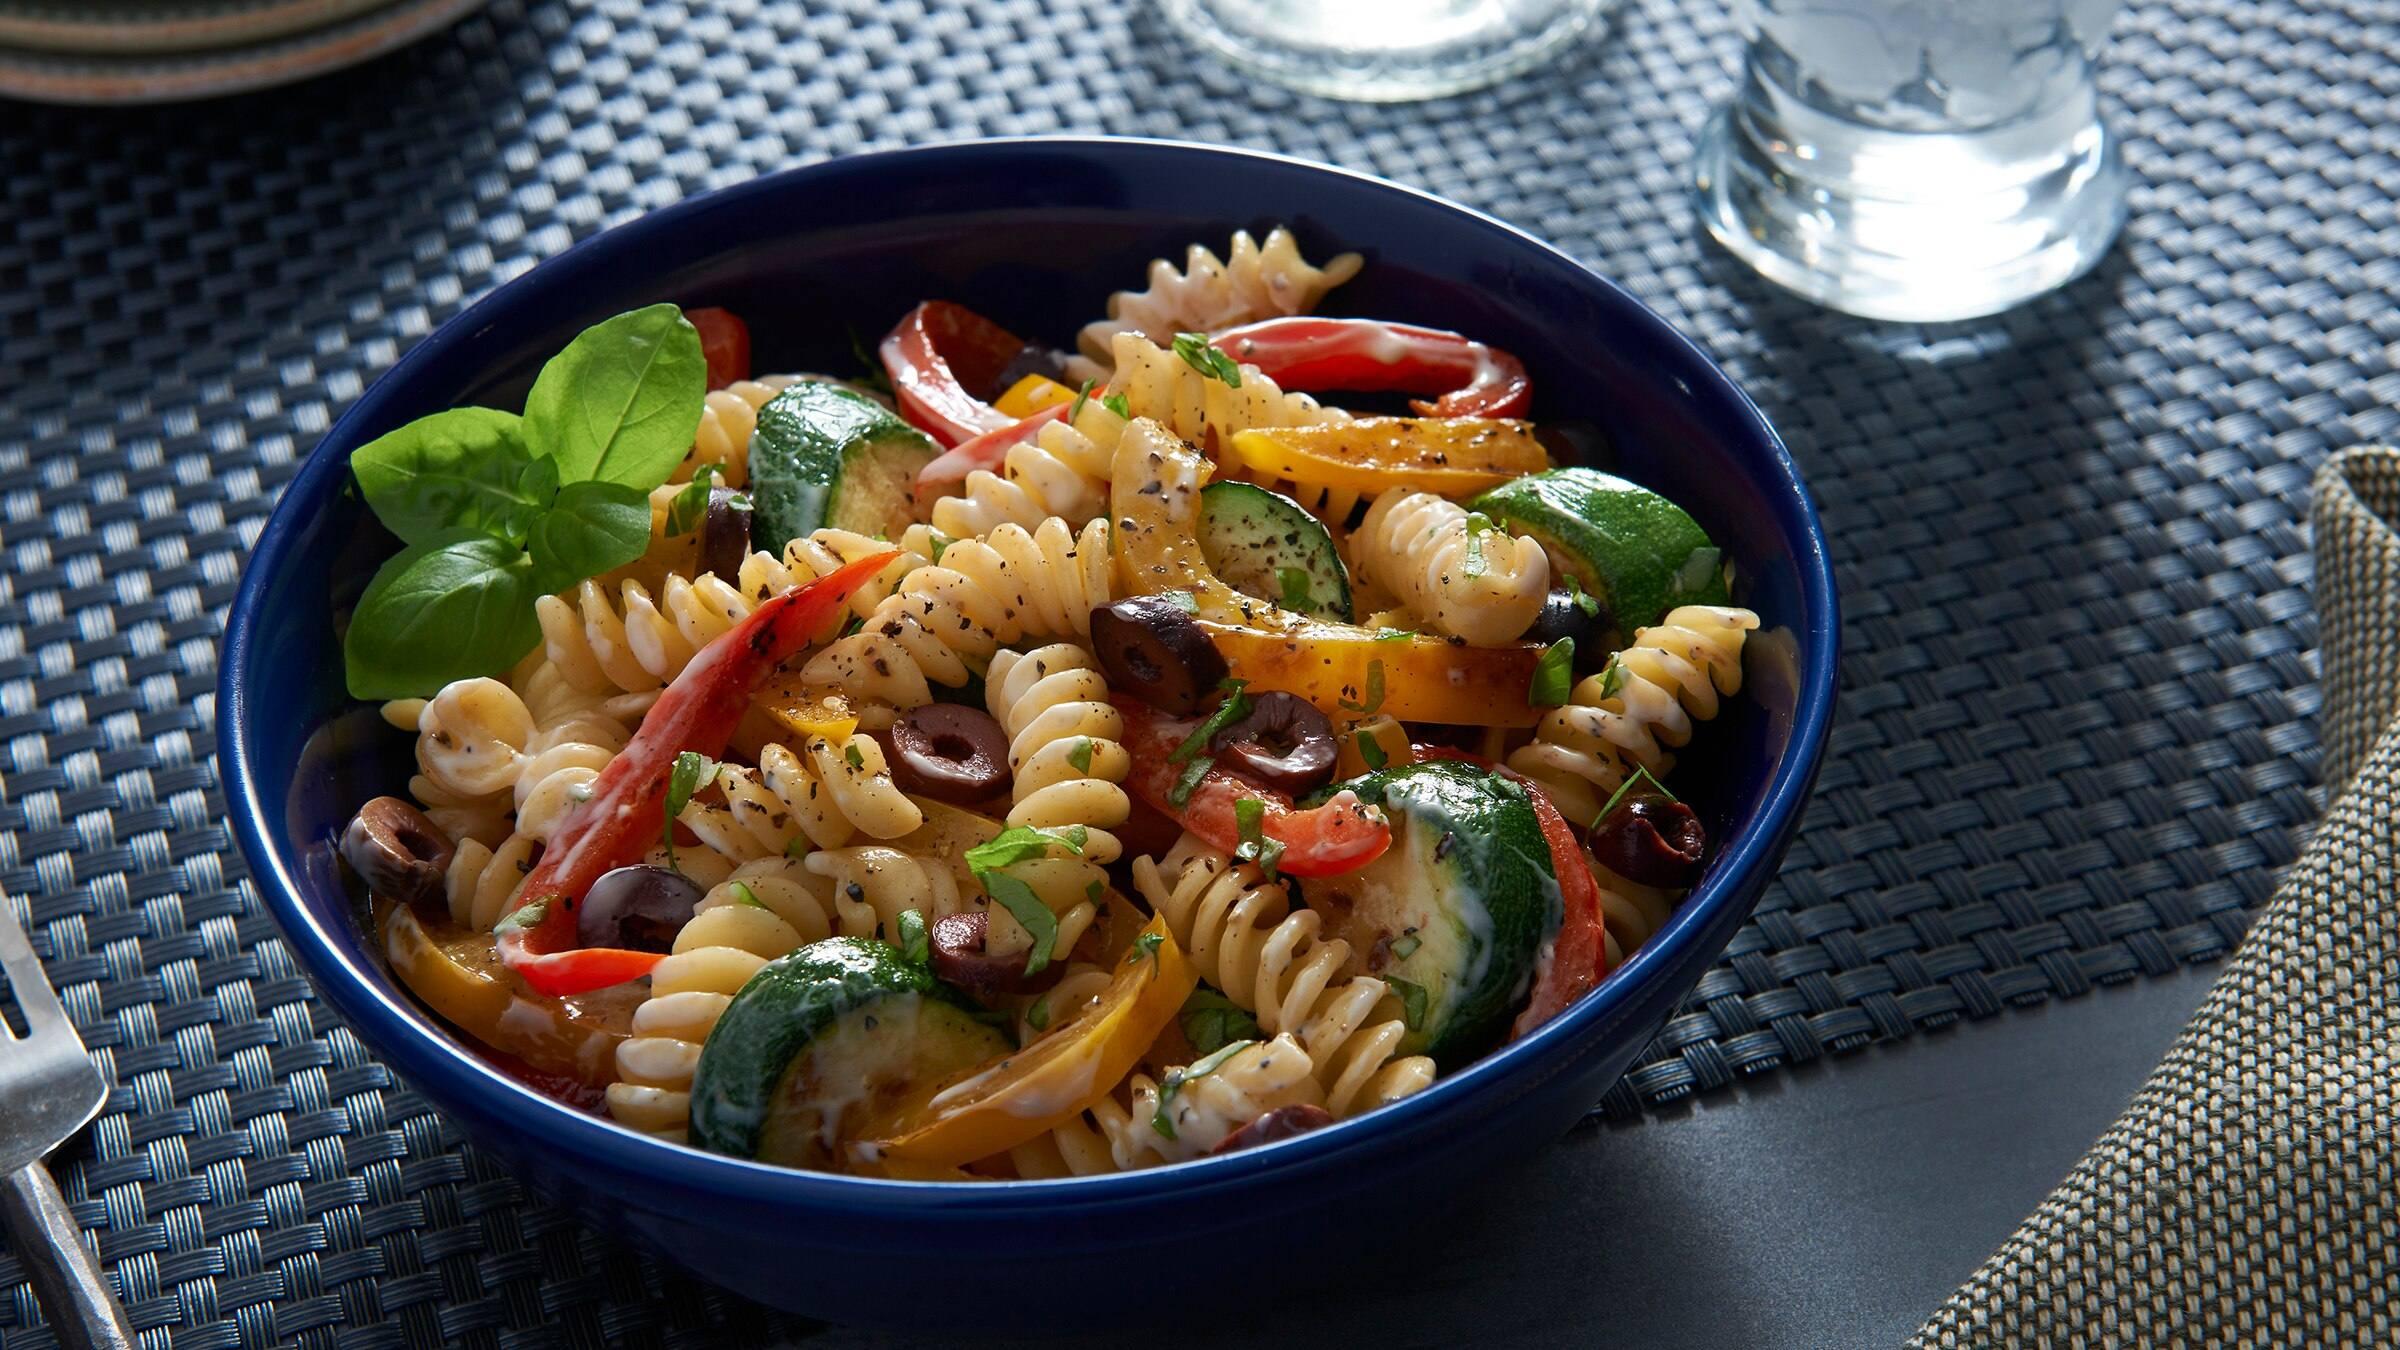 Pasta Salad with Vegetables Recipe